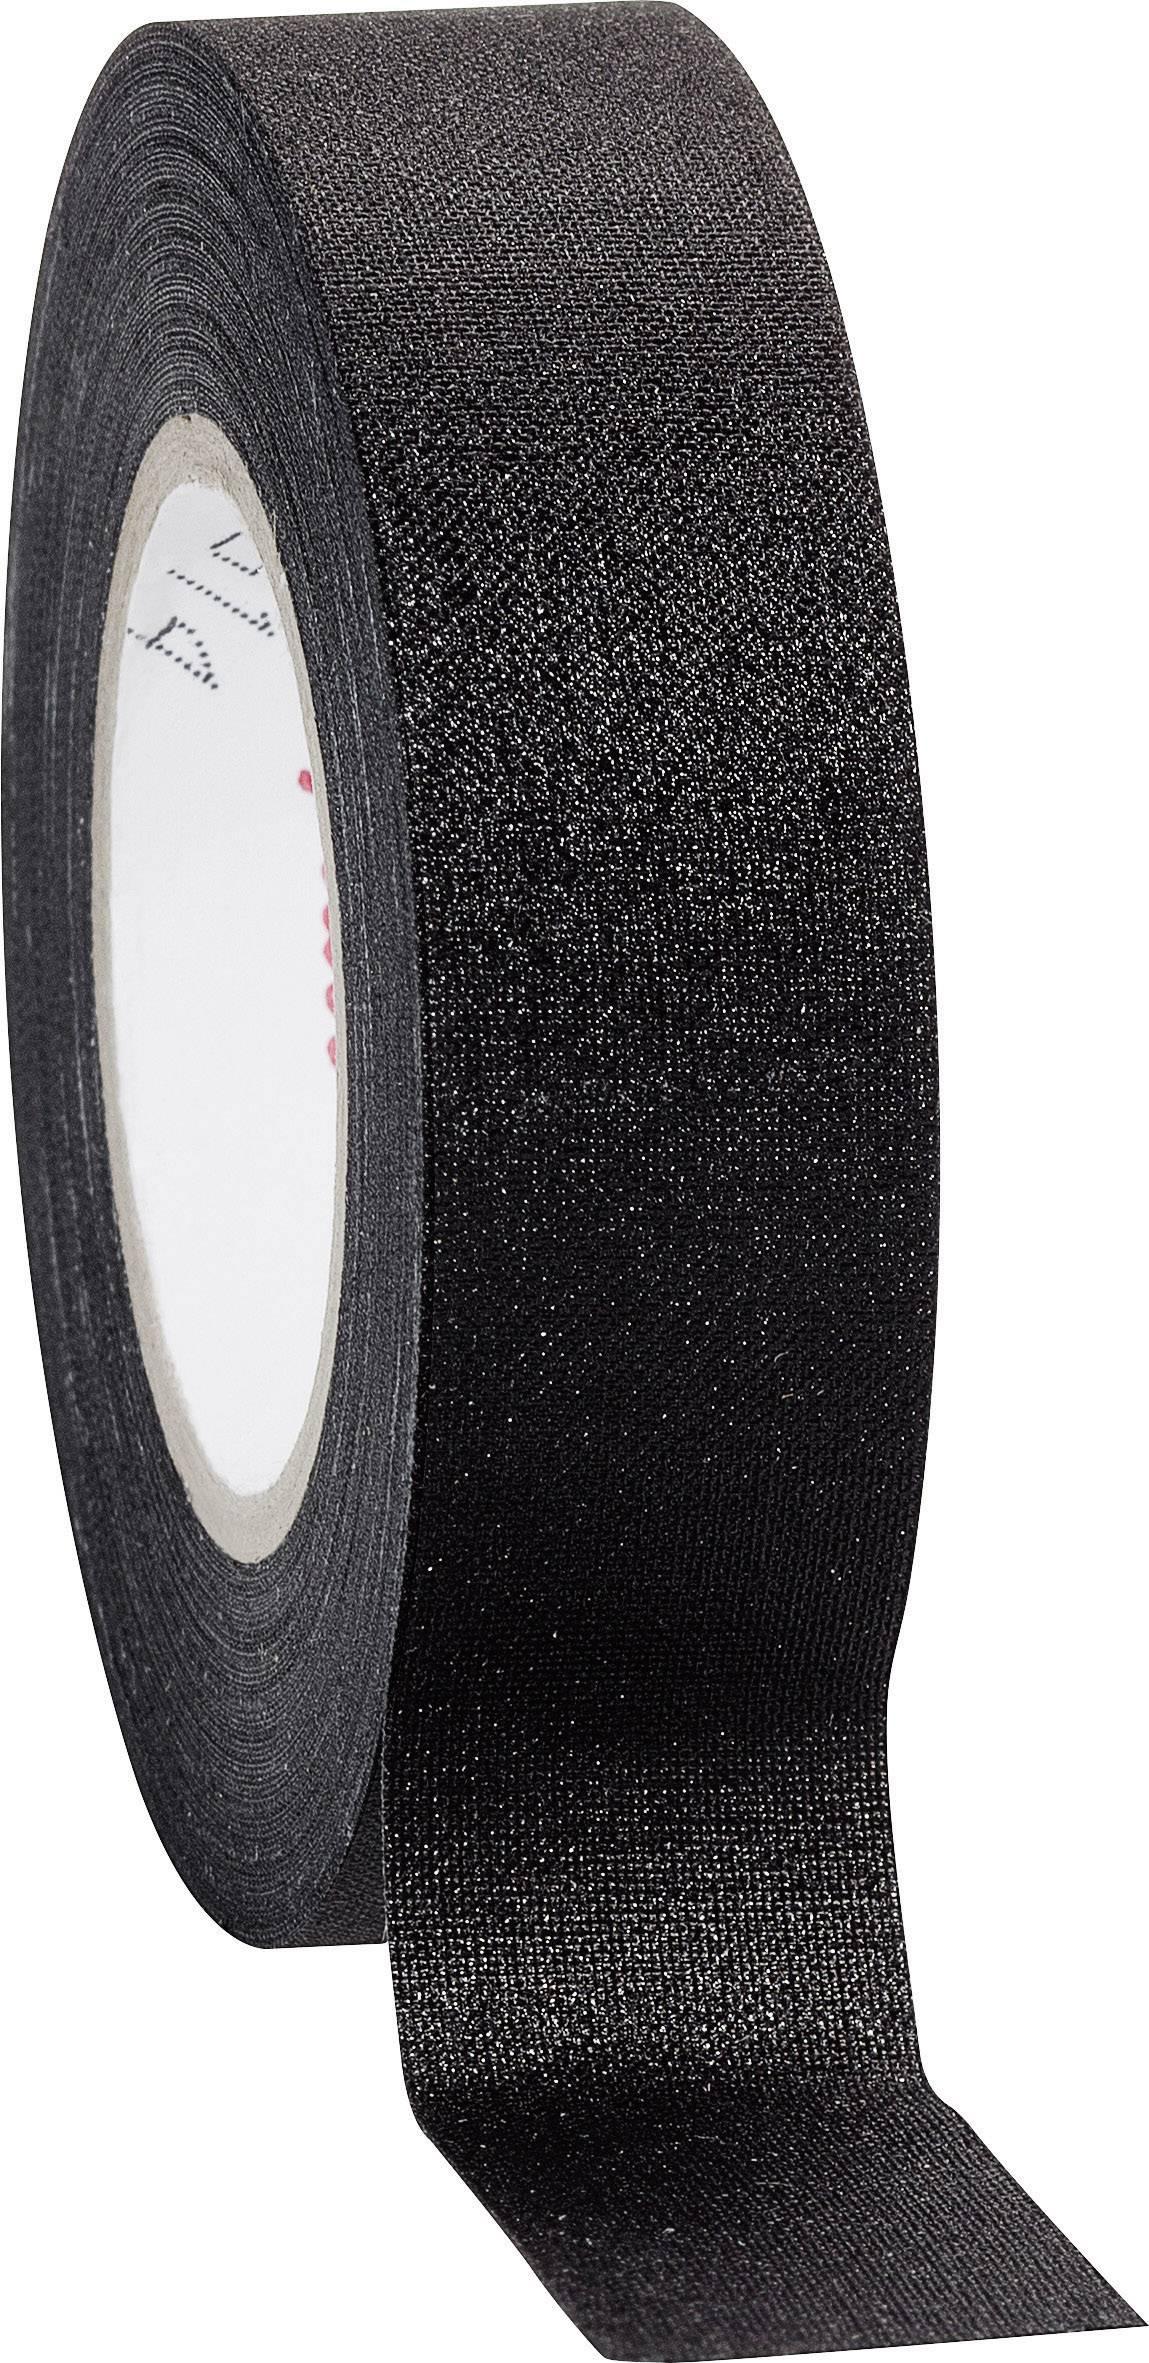 Páska so skleným vláknom Coroplast 16781 16781, (d x š) 10 m x 19 mm, čierna, 1 roliek